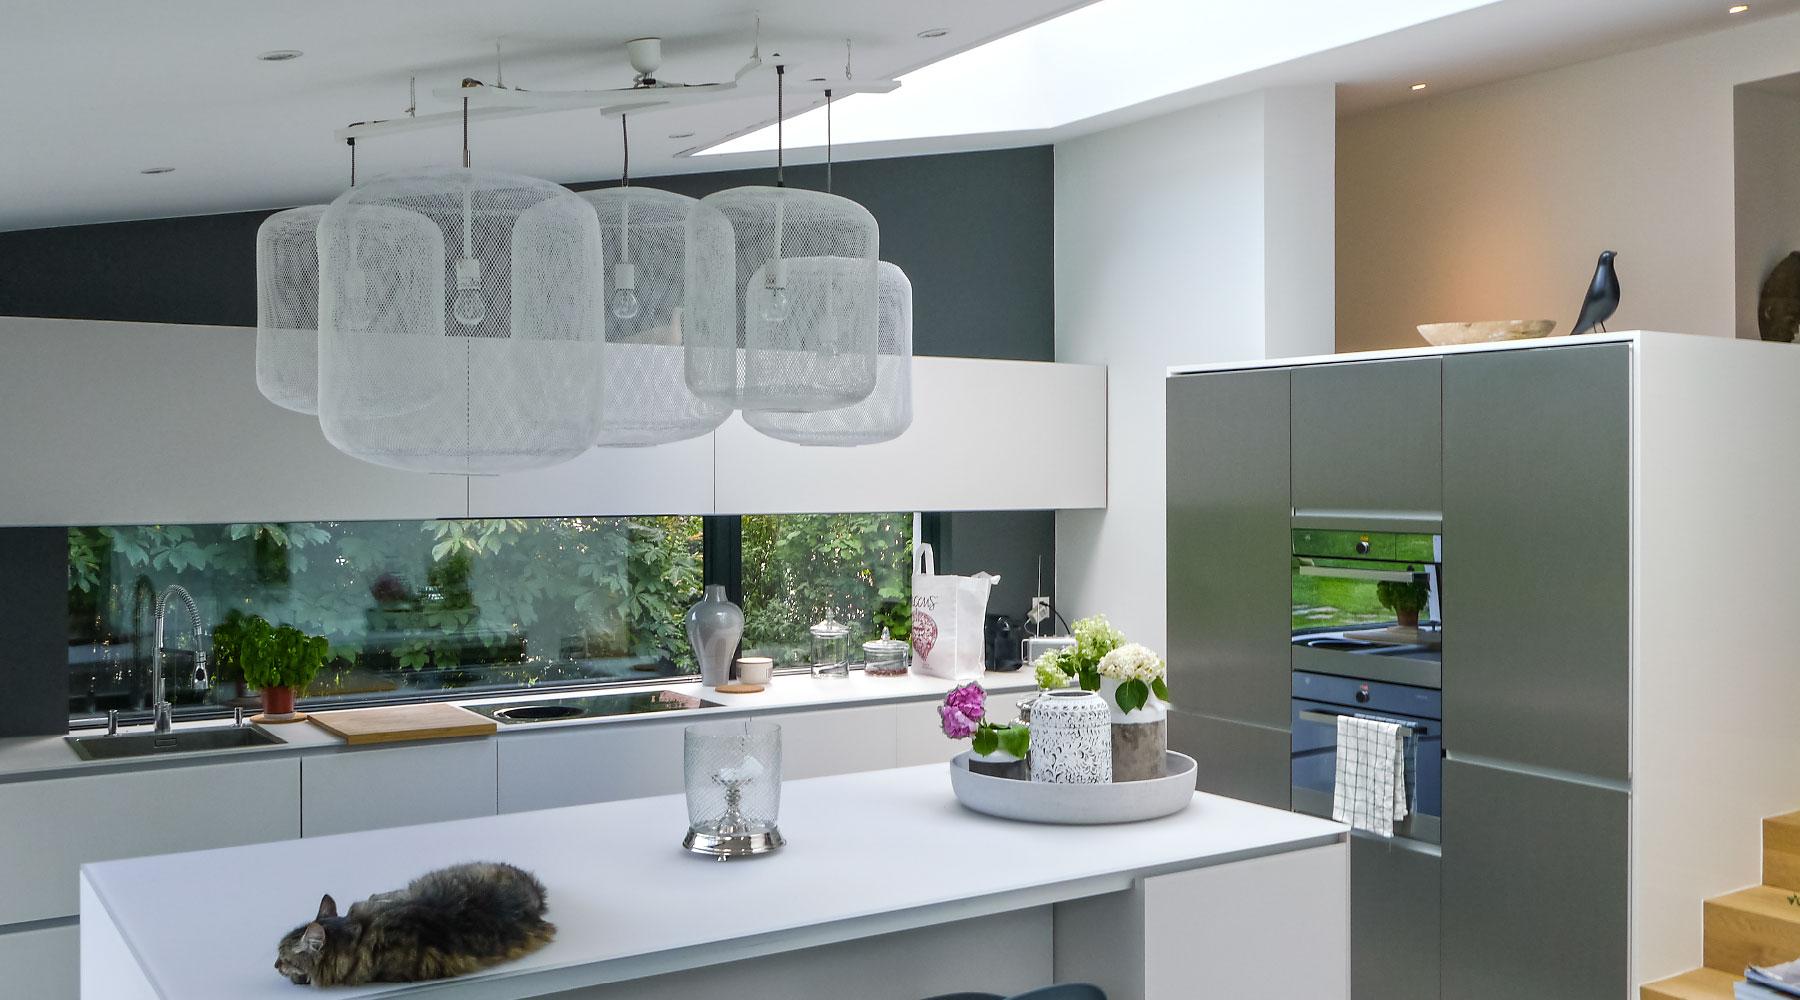 lichtband fenster k che ikea k che sockel sp lbecken miele herd in arbeitsplatte glas. Black Bedroom Furniture Sets. Home Design Ideas